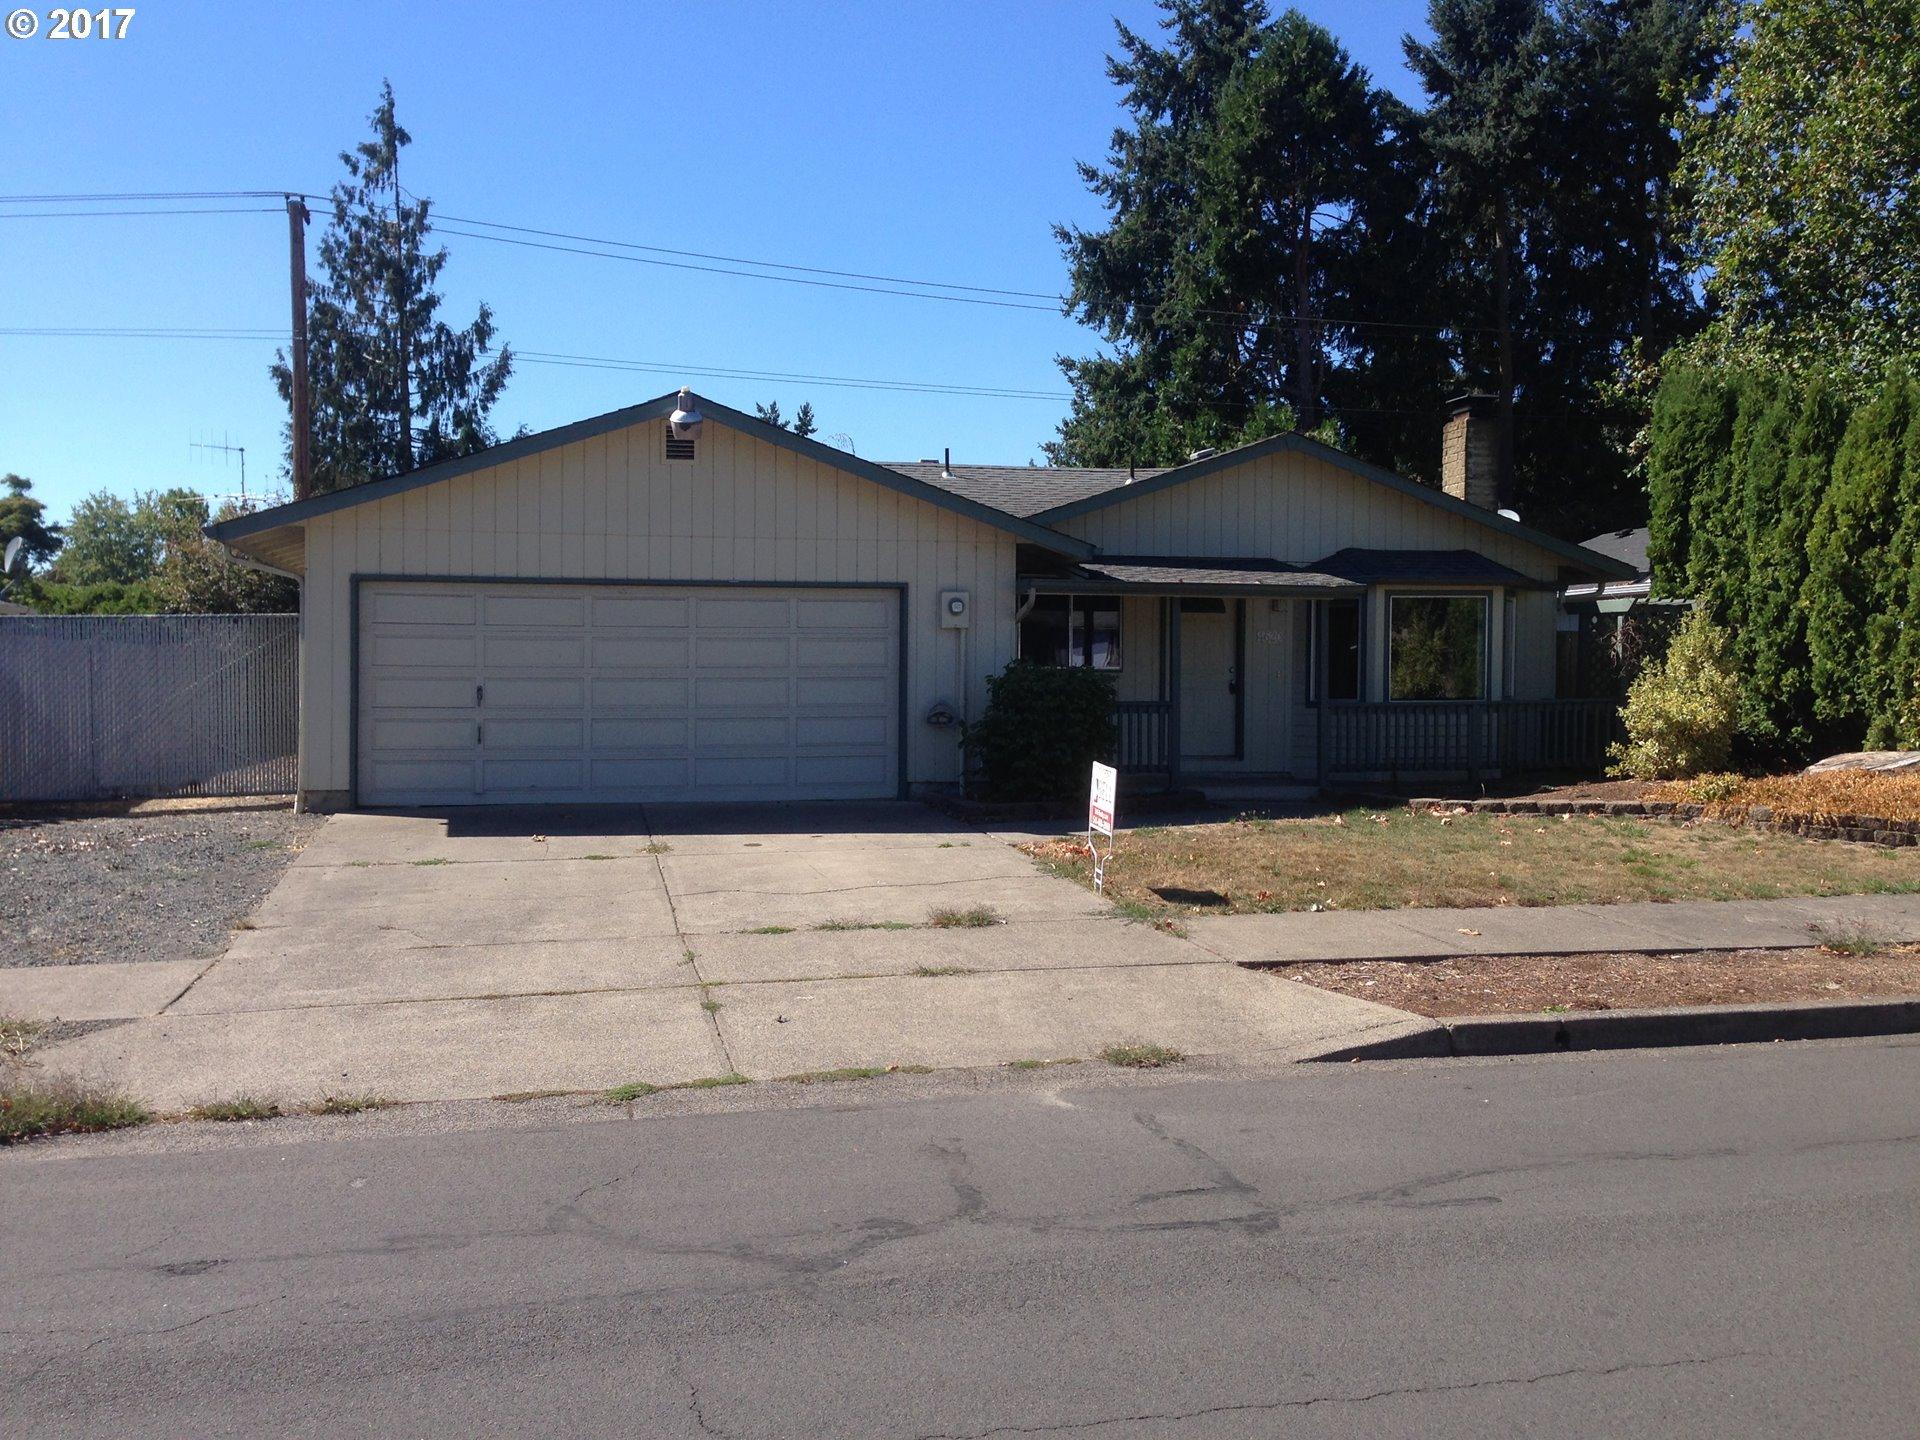 4620 SOUZA CT, Eugene, OR 97402